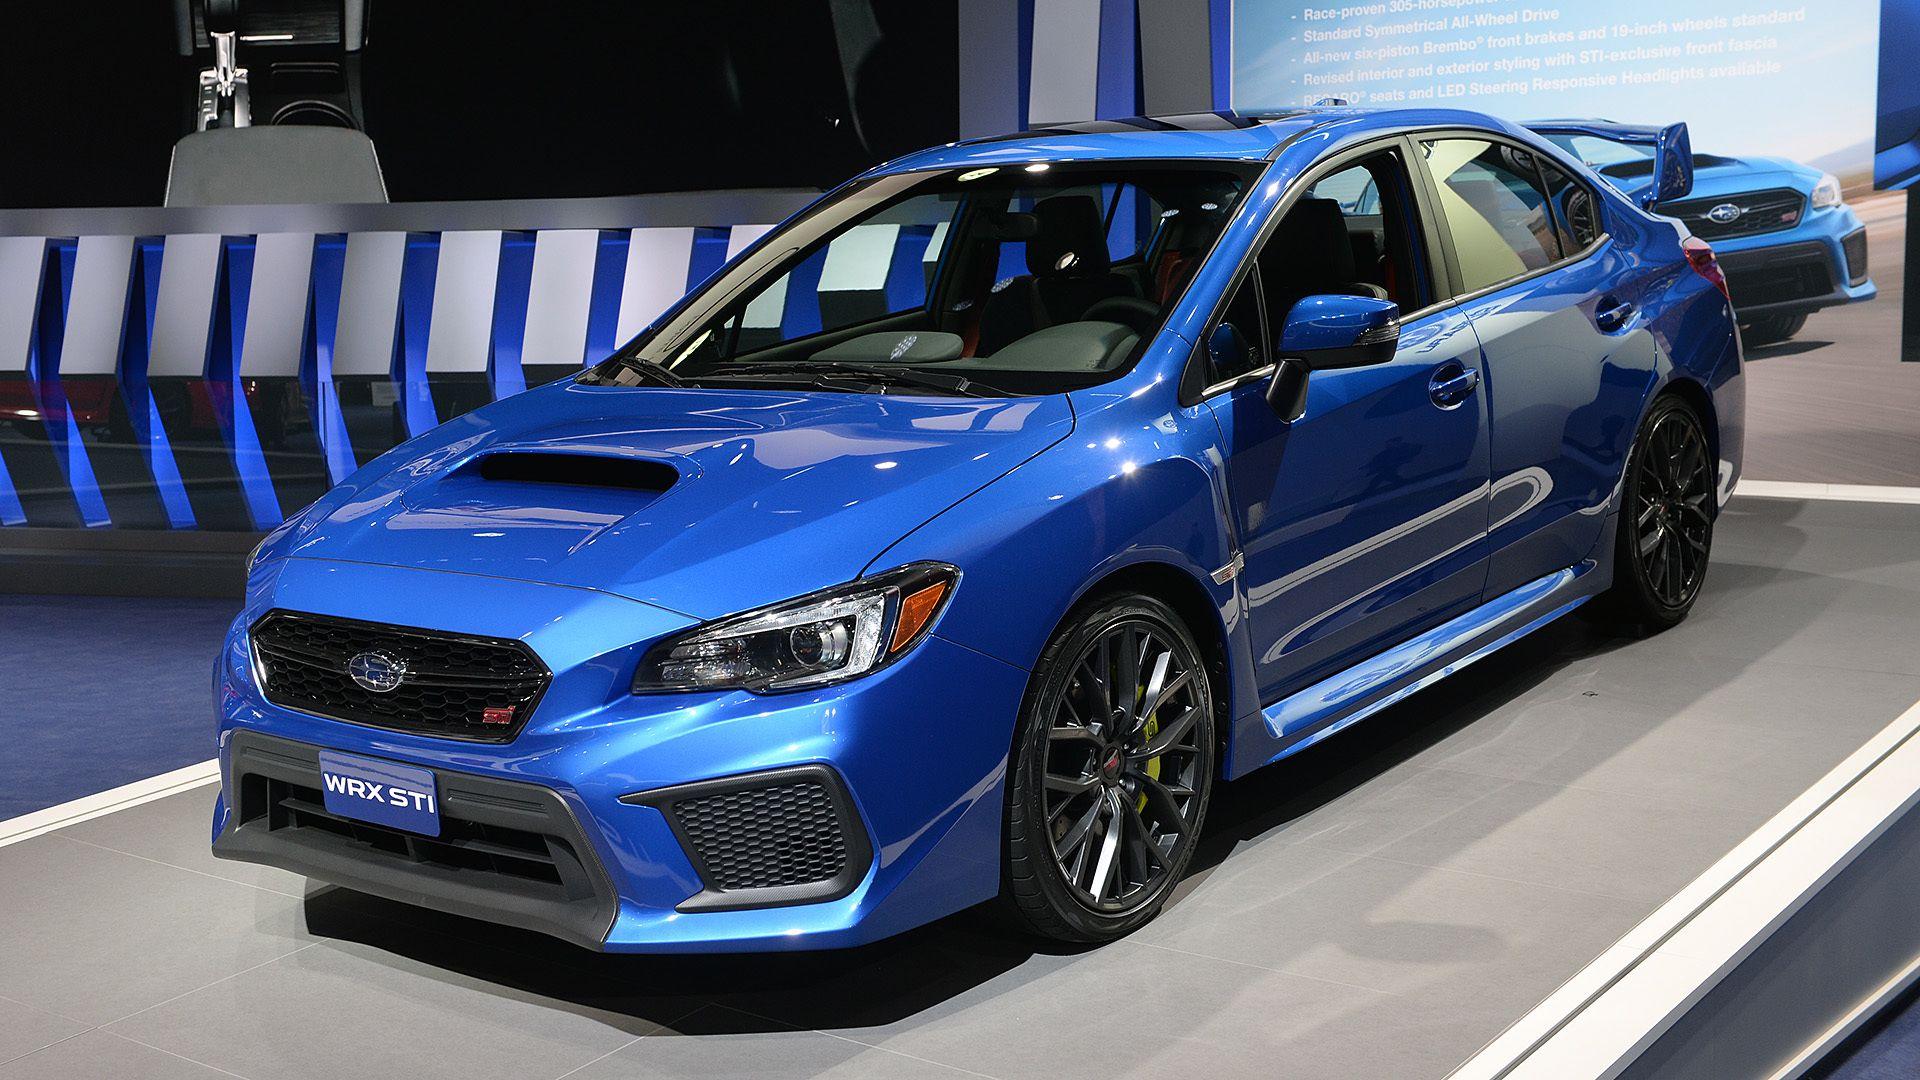 2018 Subaru Impreza Wrx Sti